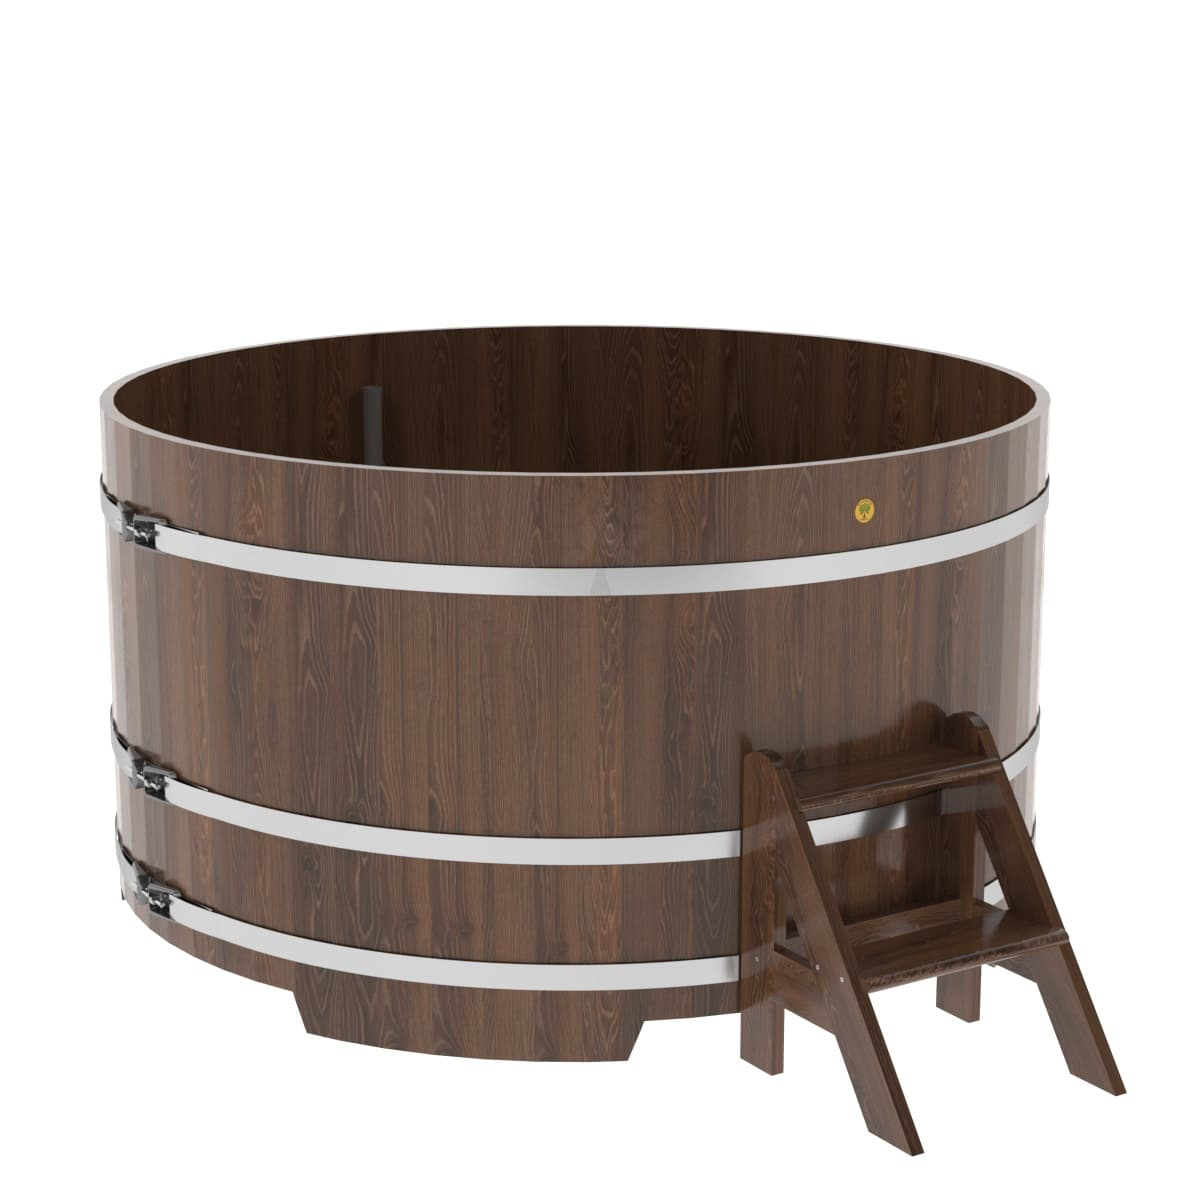 Купель круглая из дуба BentWood D=1,80